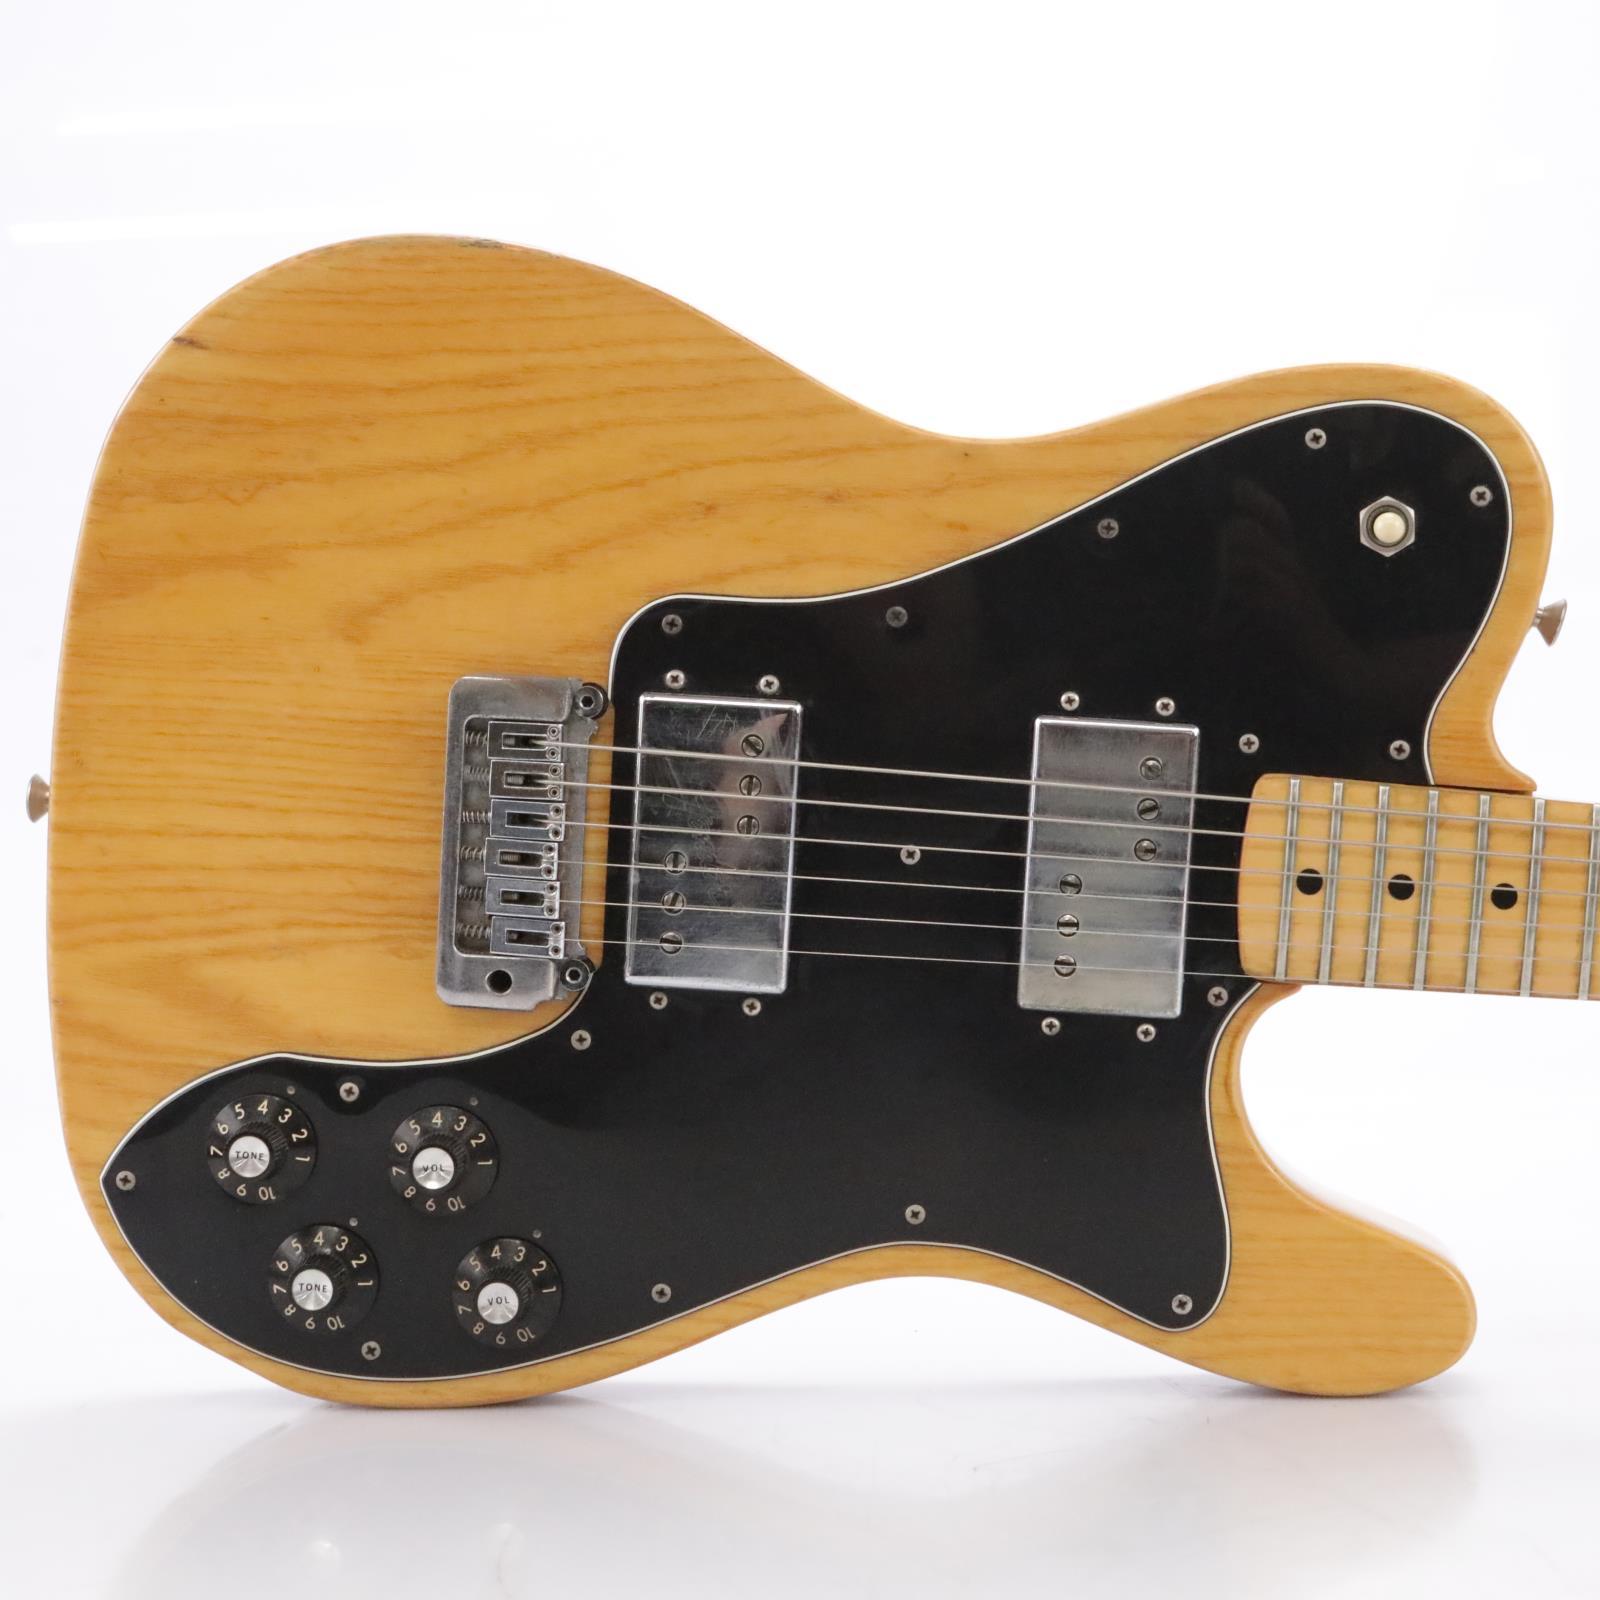 Vintage 1977 Fender Telecaster Deluxe Guitar Natural w/ Tremolo & Case #43805